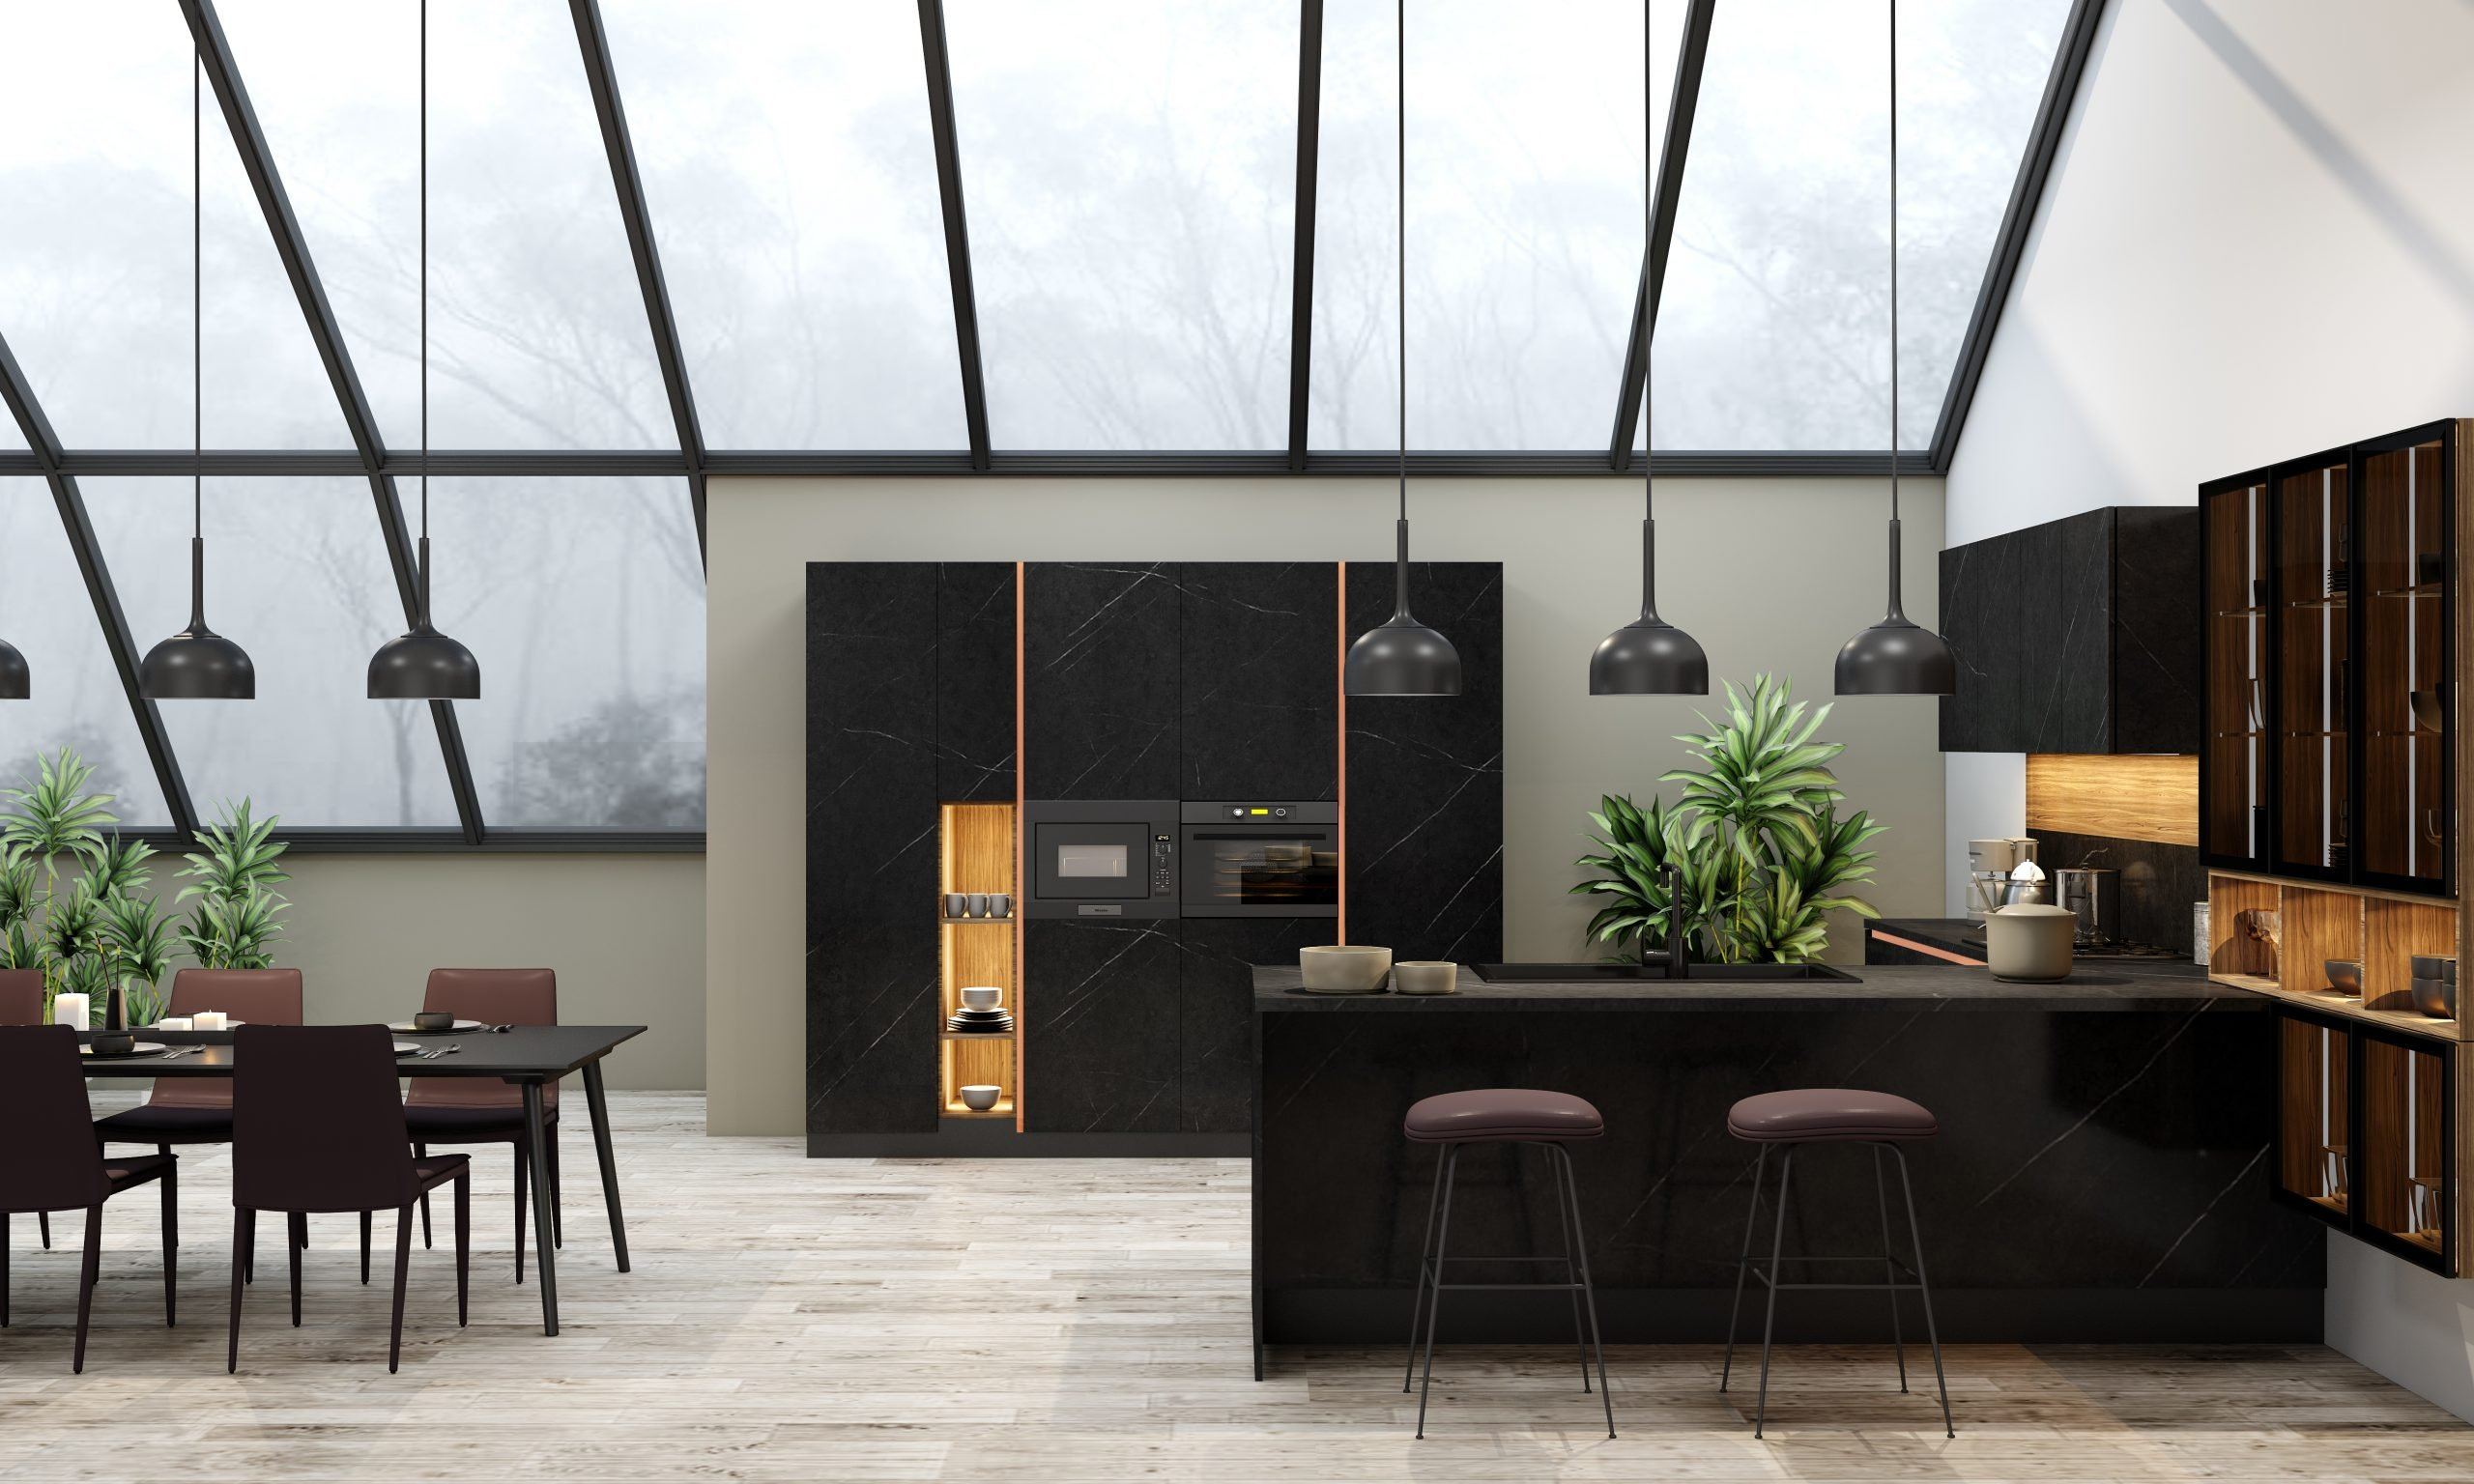 Premiumline Kitchen With Gold Handleless Profile in Levanto Black Stone Finish